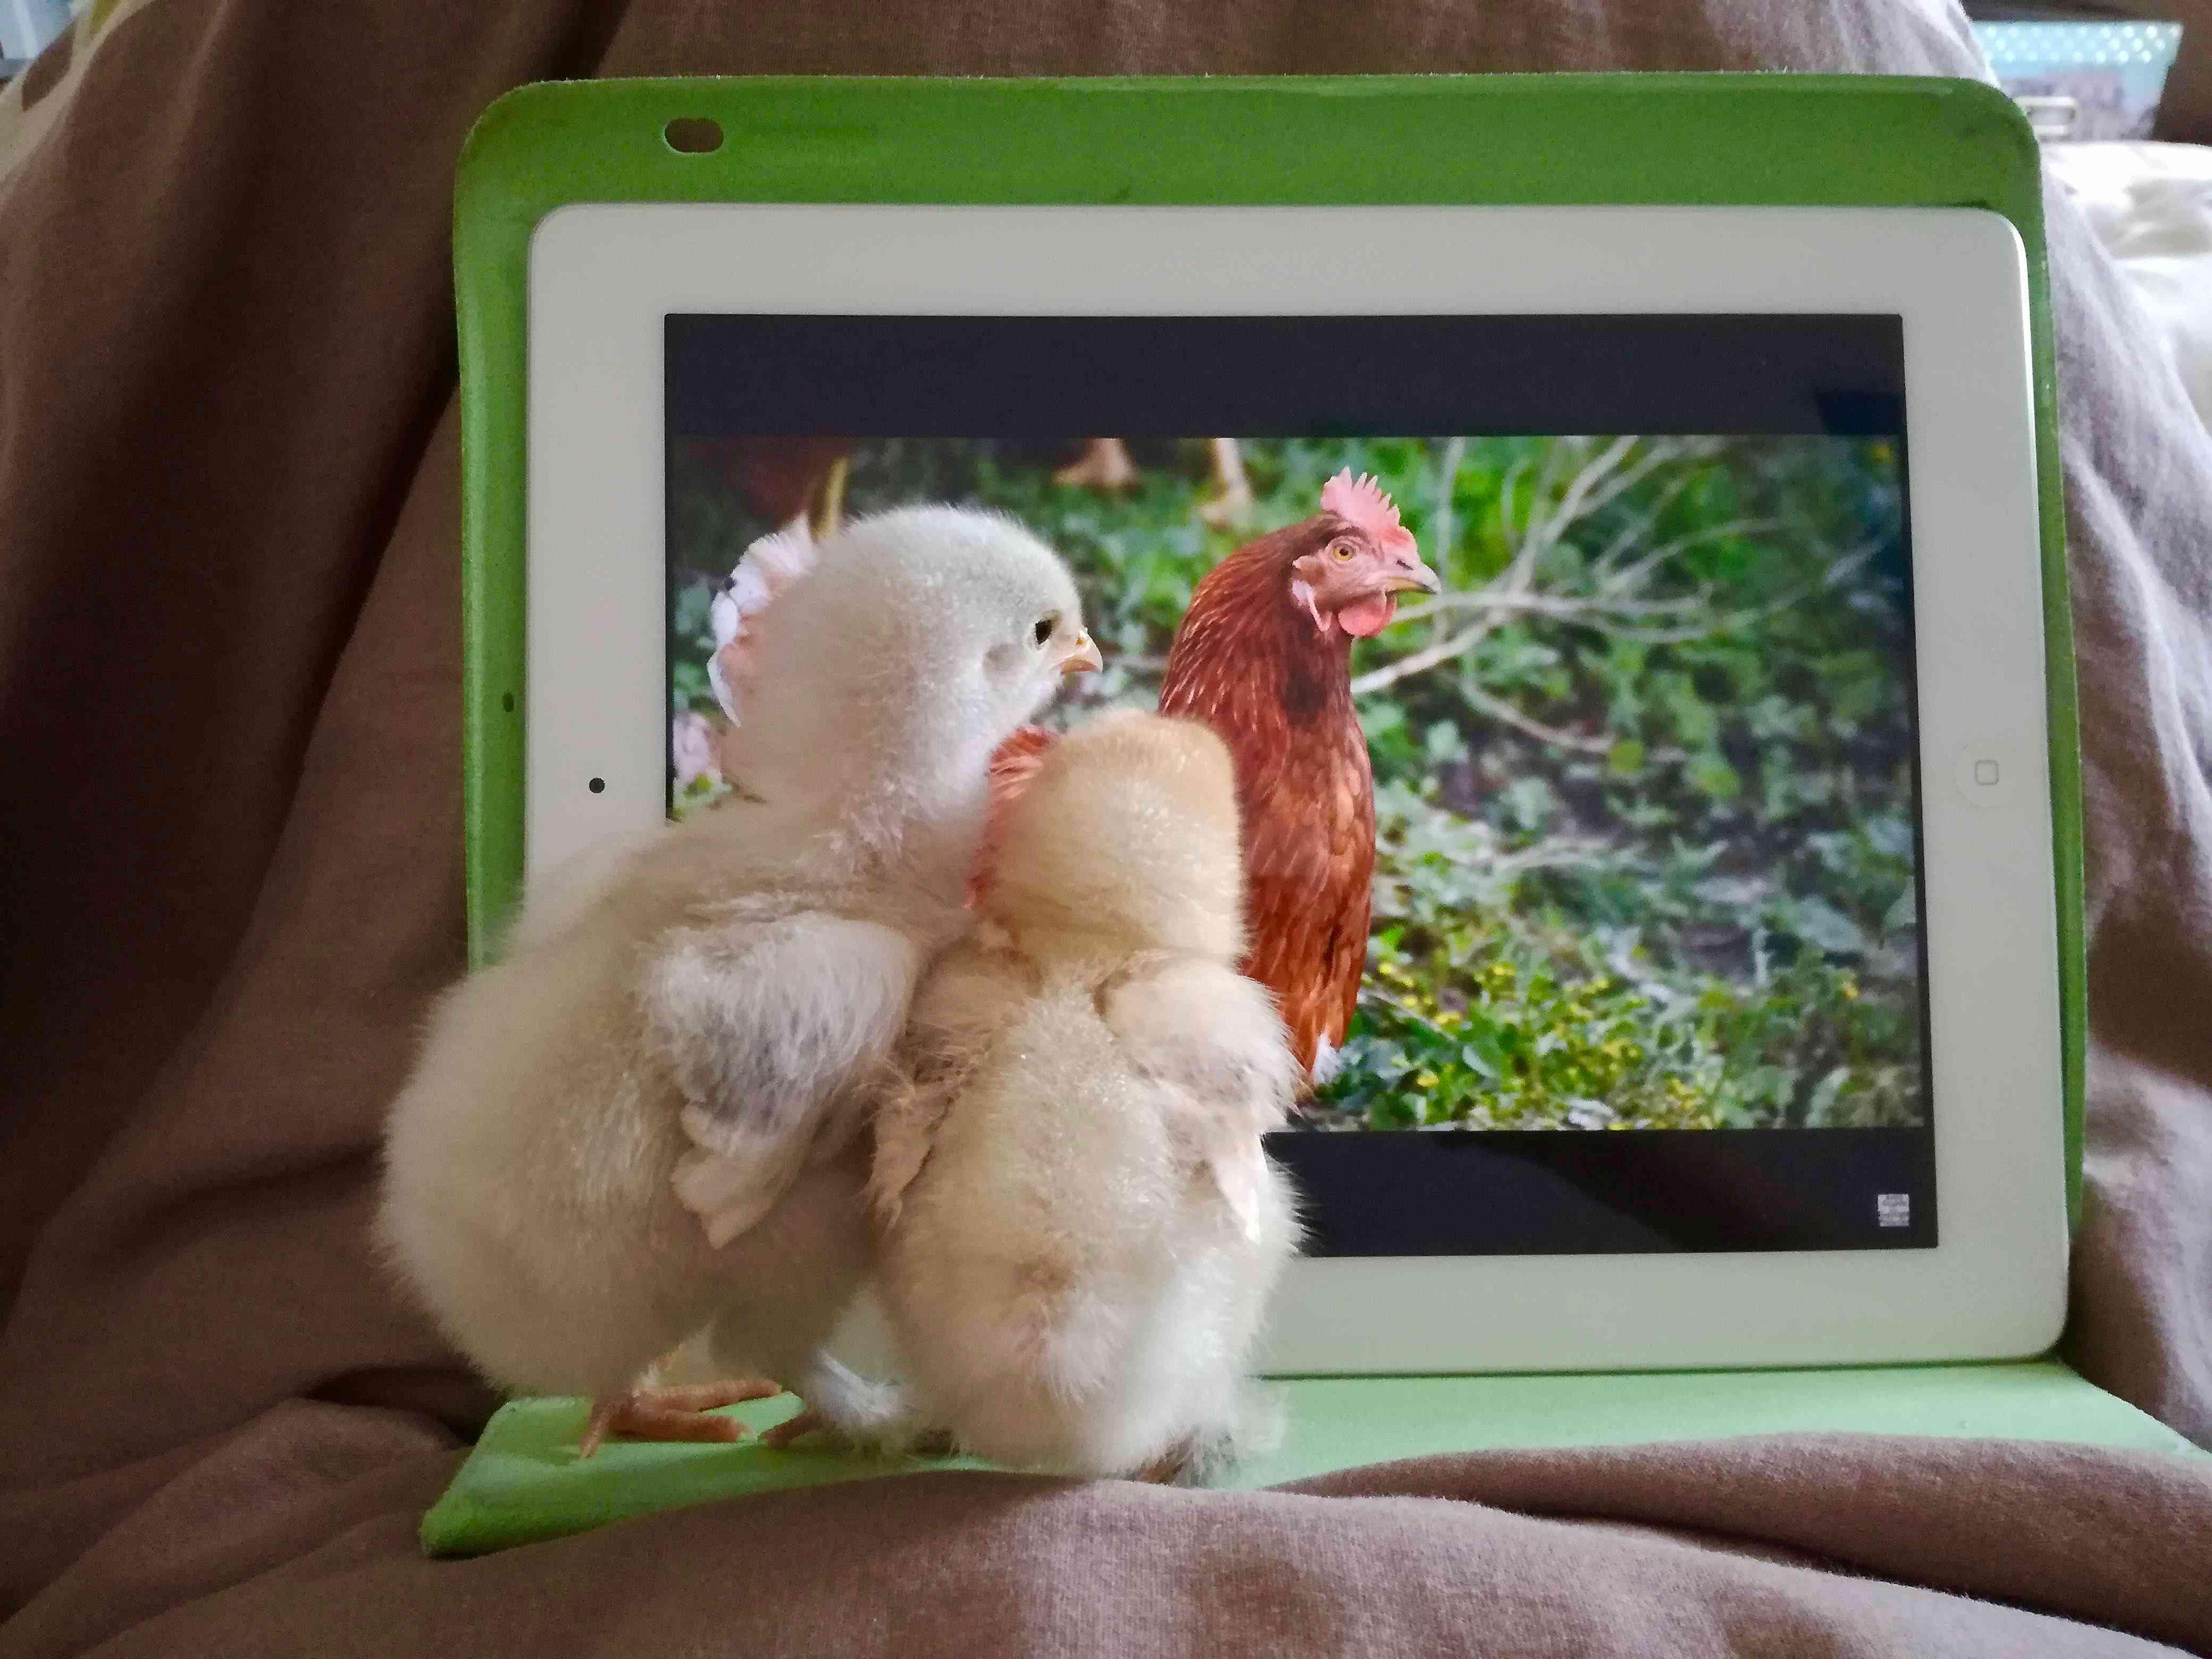 Inquisitive Chicks